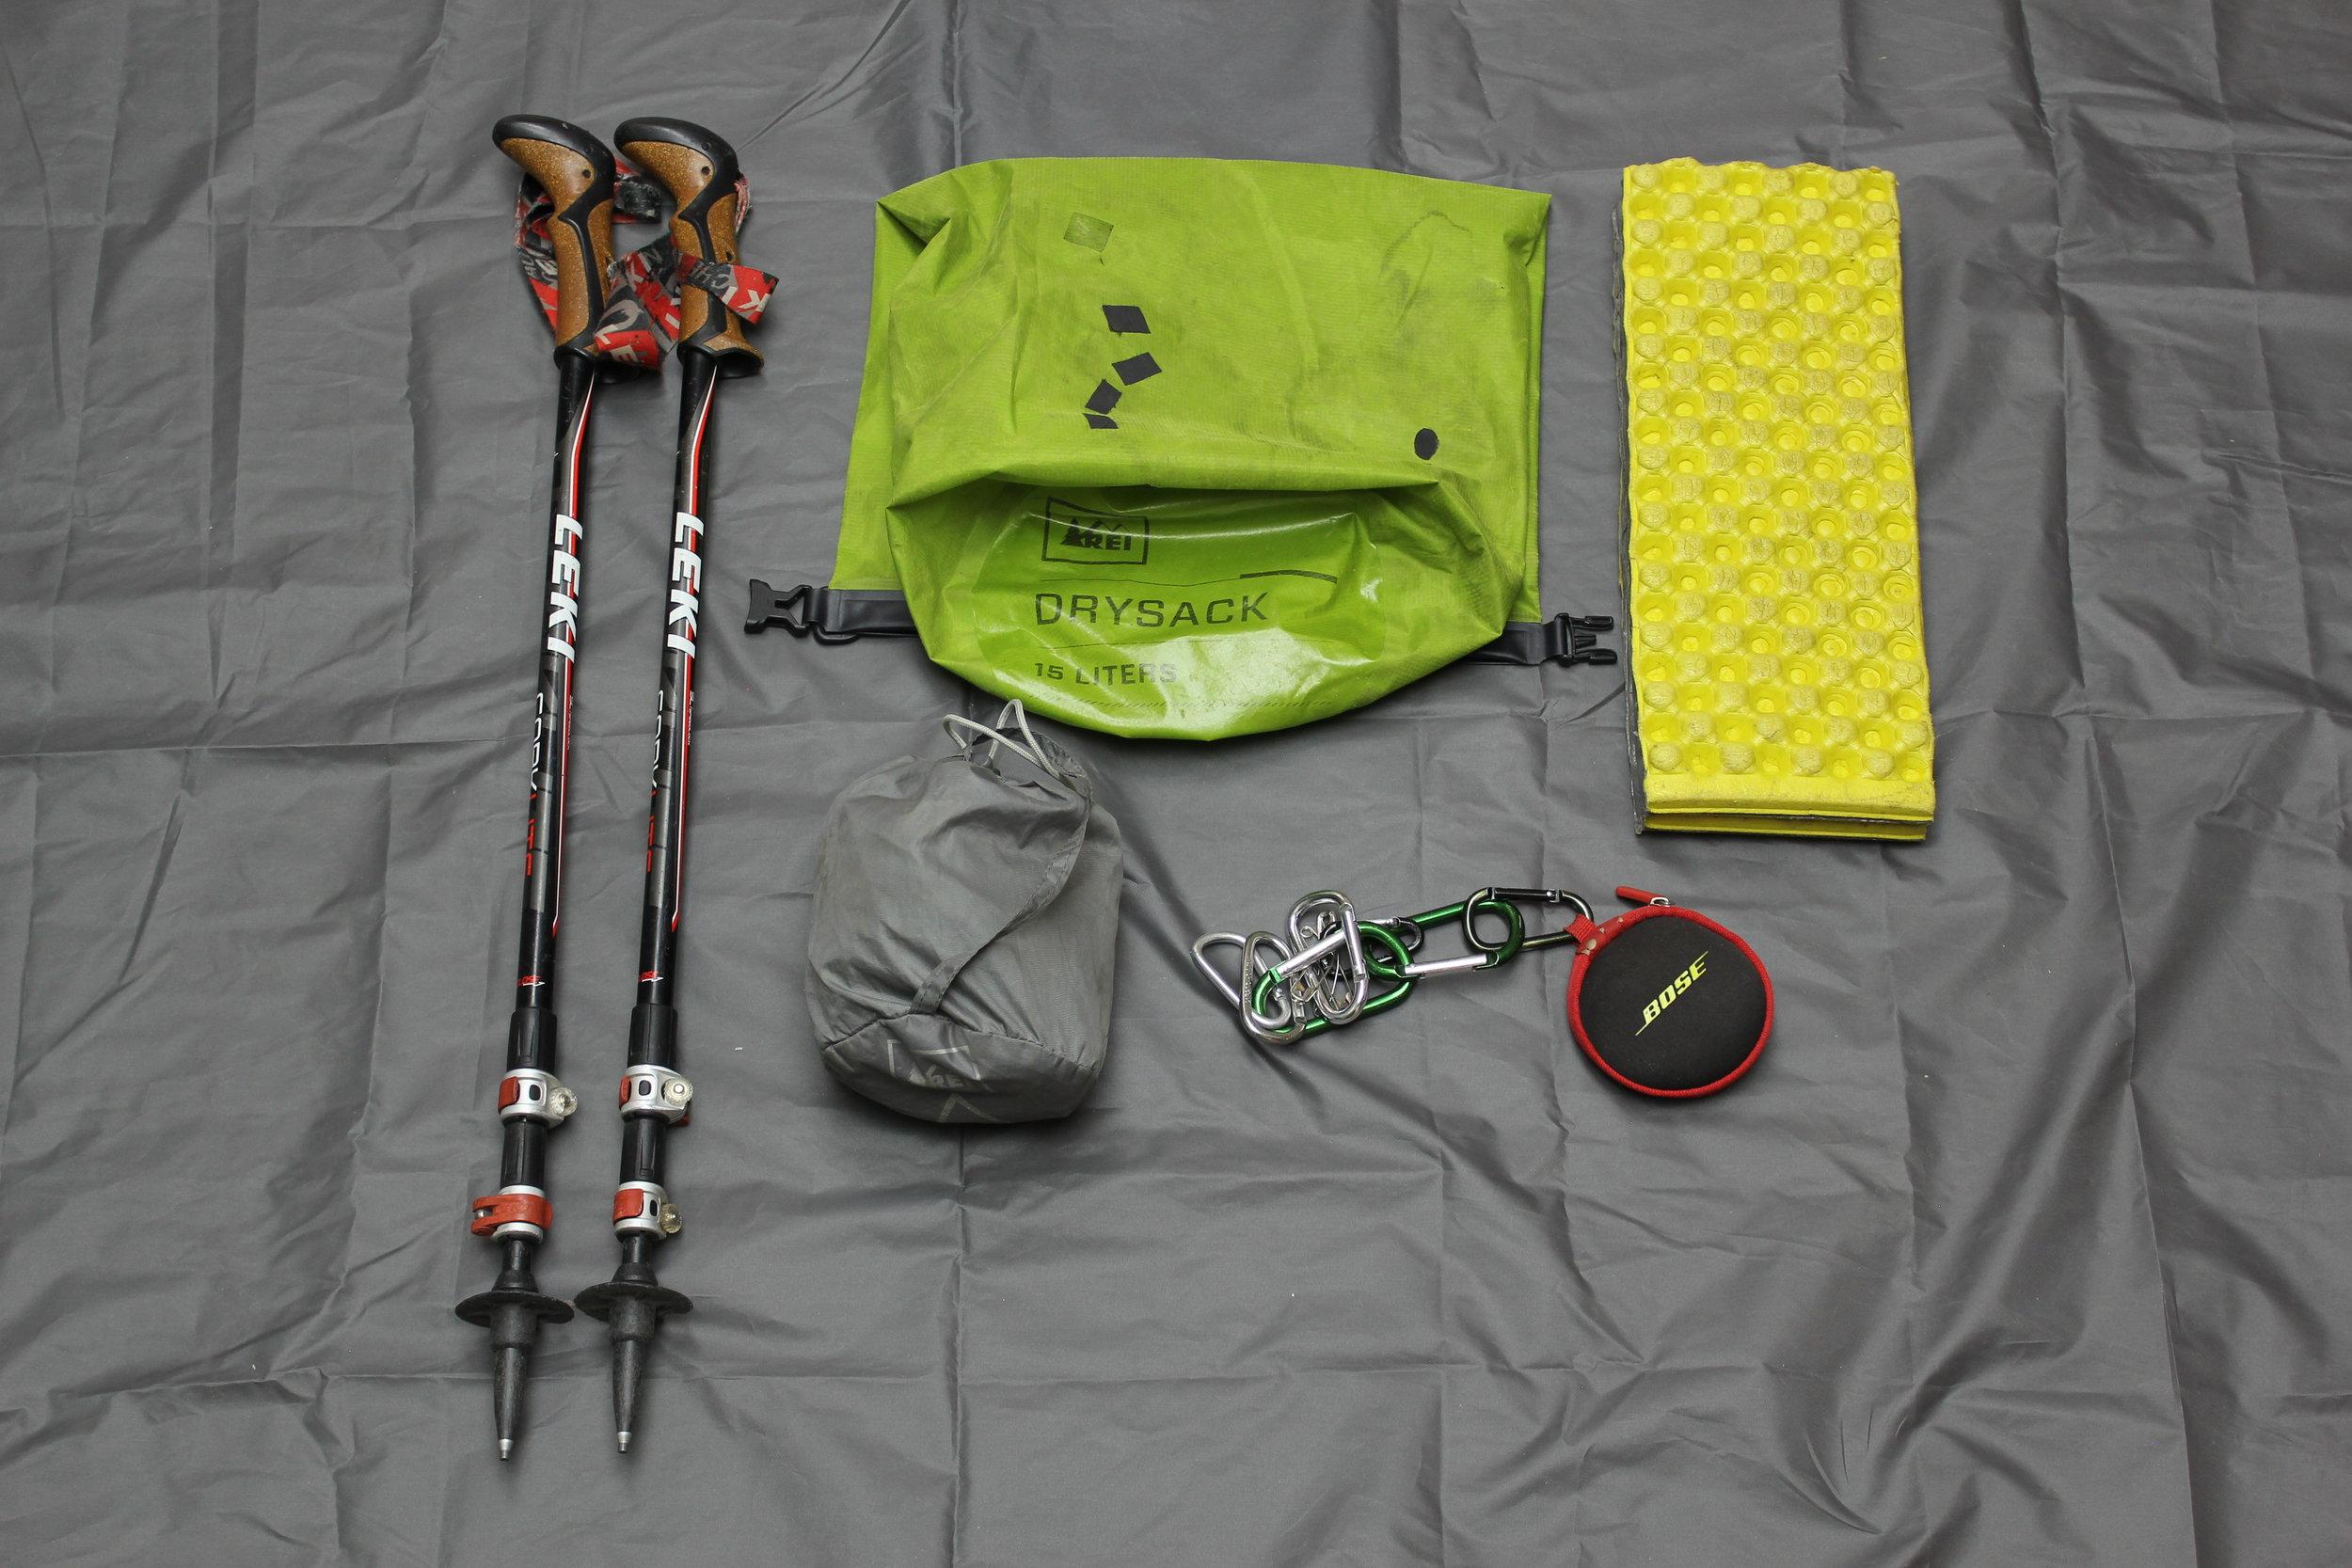 Leki Trekking Poles  REI Dry Sack - Food Bag  REI Pack Rain Cover  Bose SportSound Headphones  Cut Z-Lite Pad as Butt/Sitting Pad